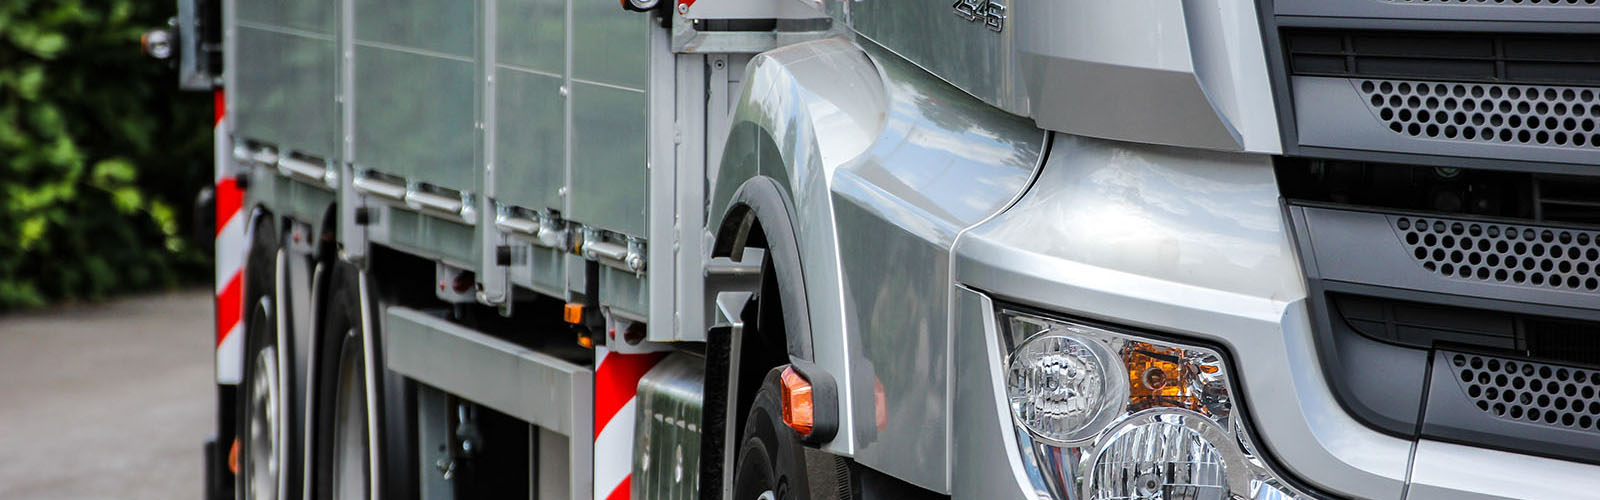 ES-GE-Produktportfolio-Mercedes-Actros-LKW-Detail-2